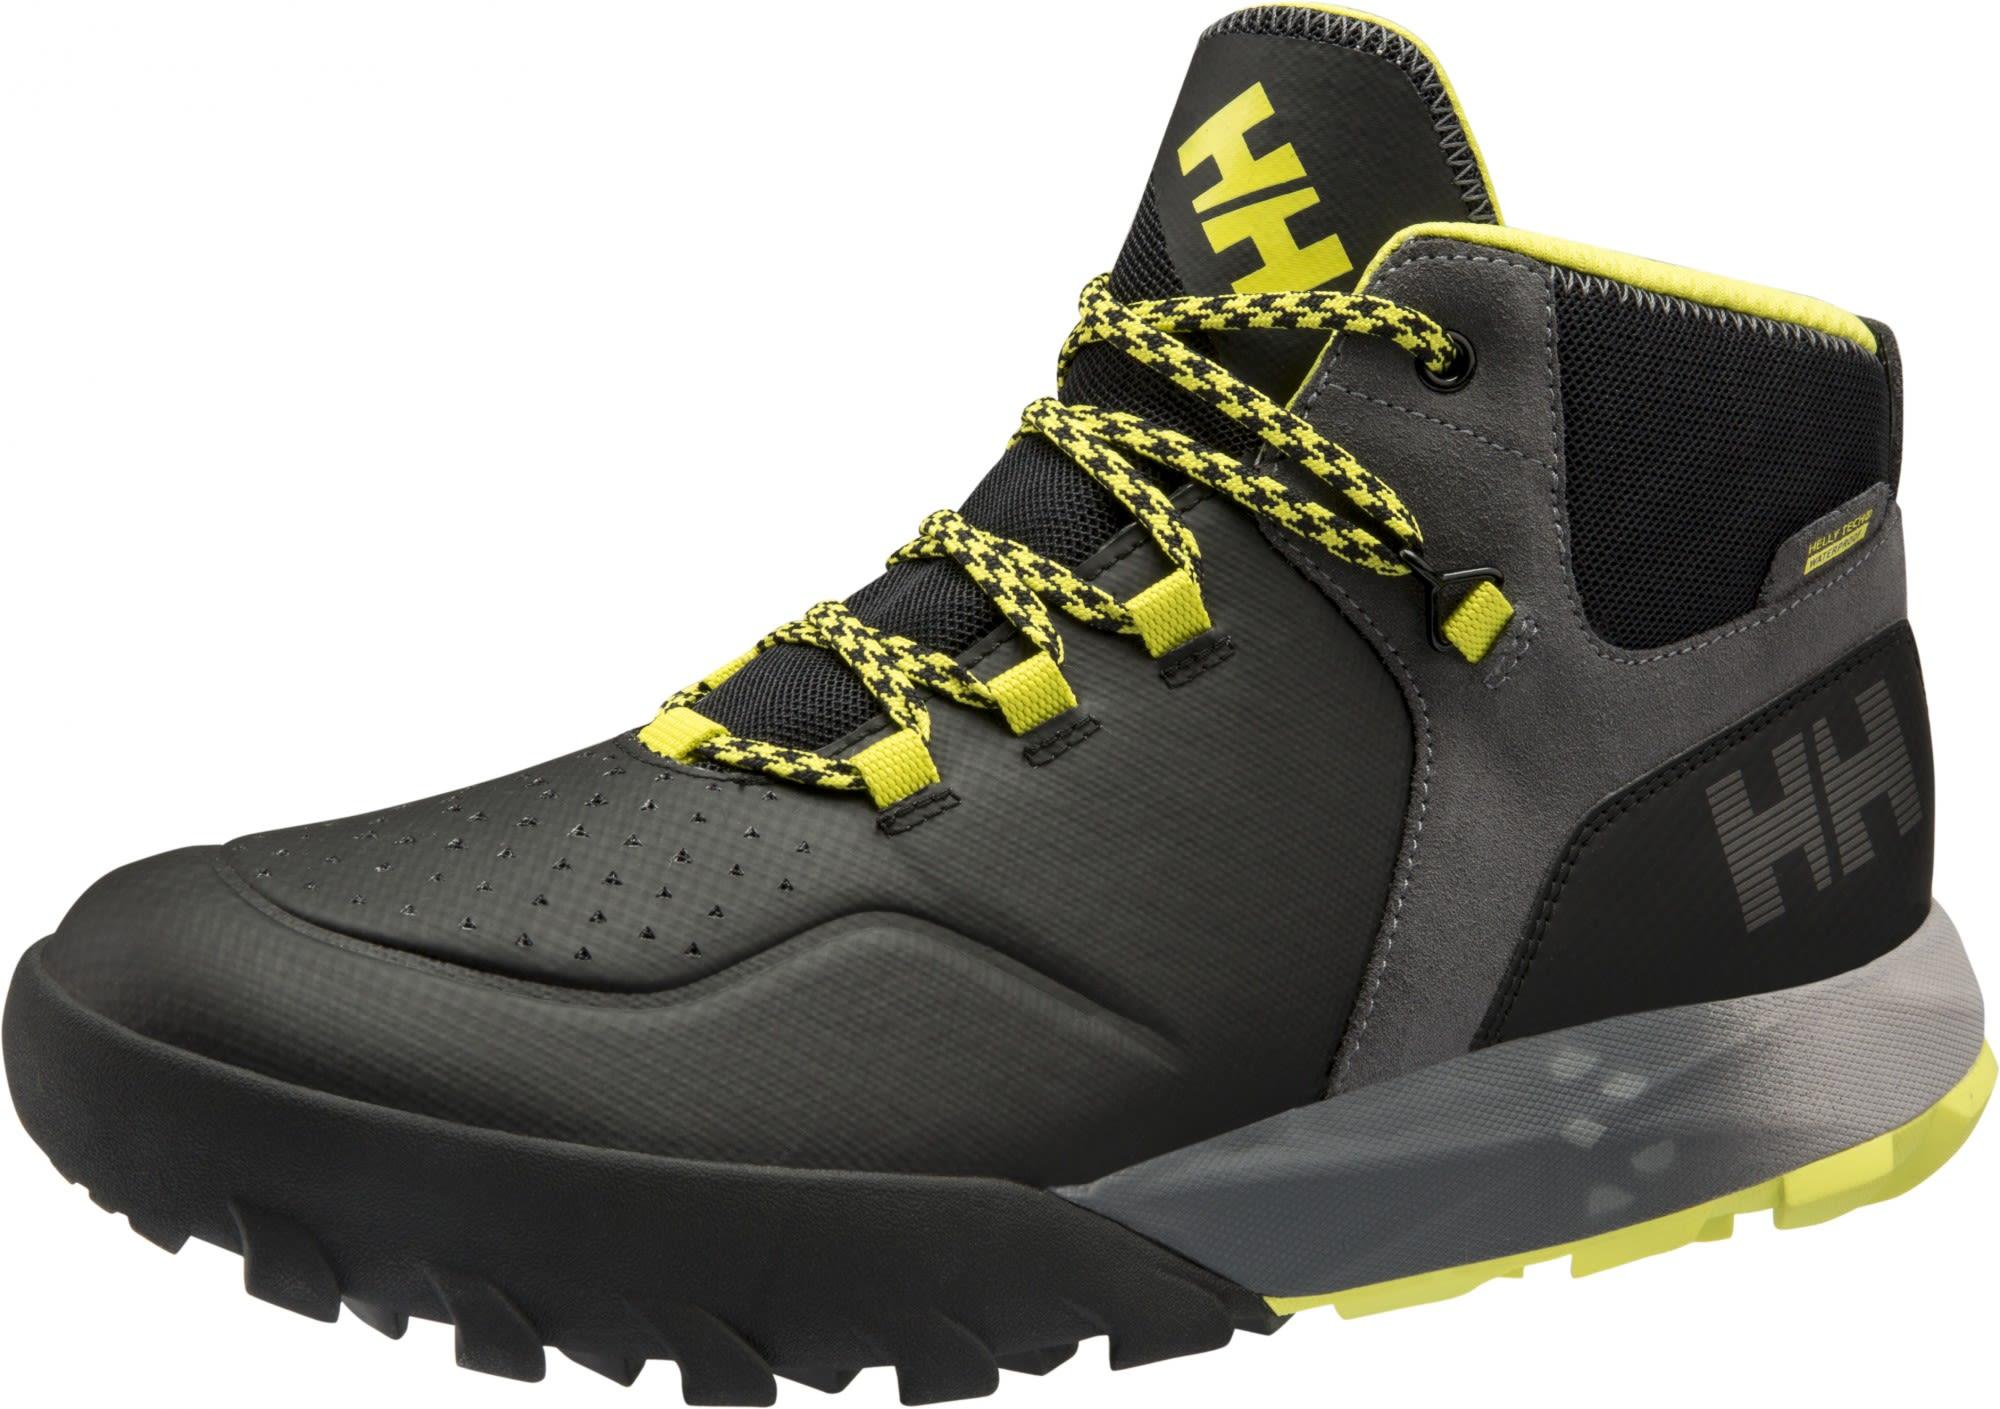 Helly Hansen Loke Rambler HT Grün, Male Hiking-& Approach-Schuh, 46